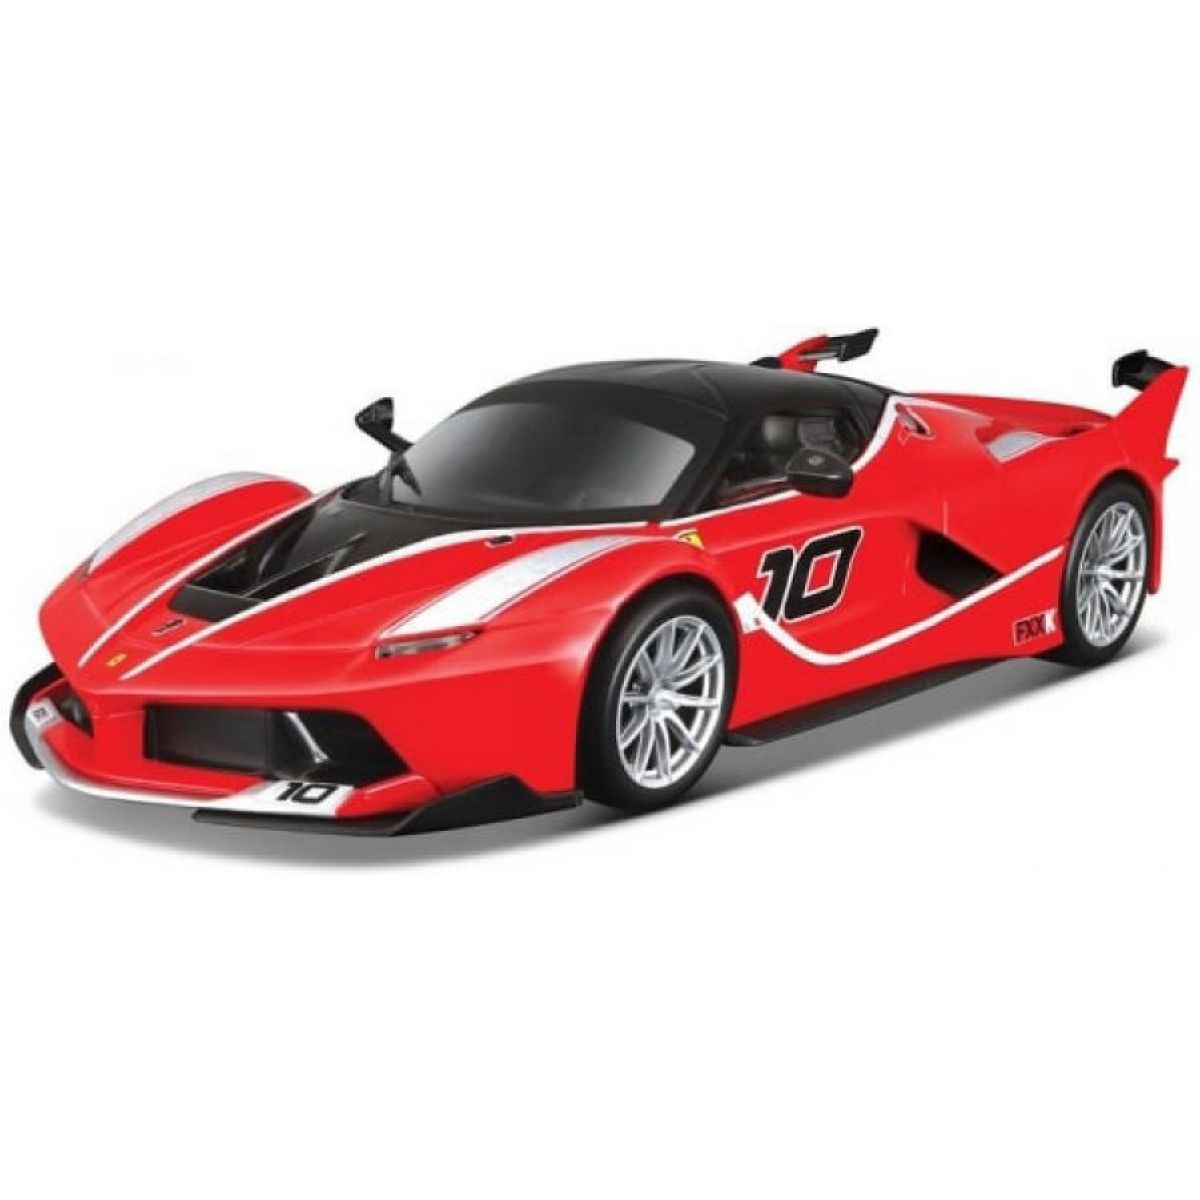 EP Line Závodní RC auto Ferrari la Ferrari 1:18 EPLINE